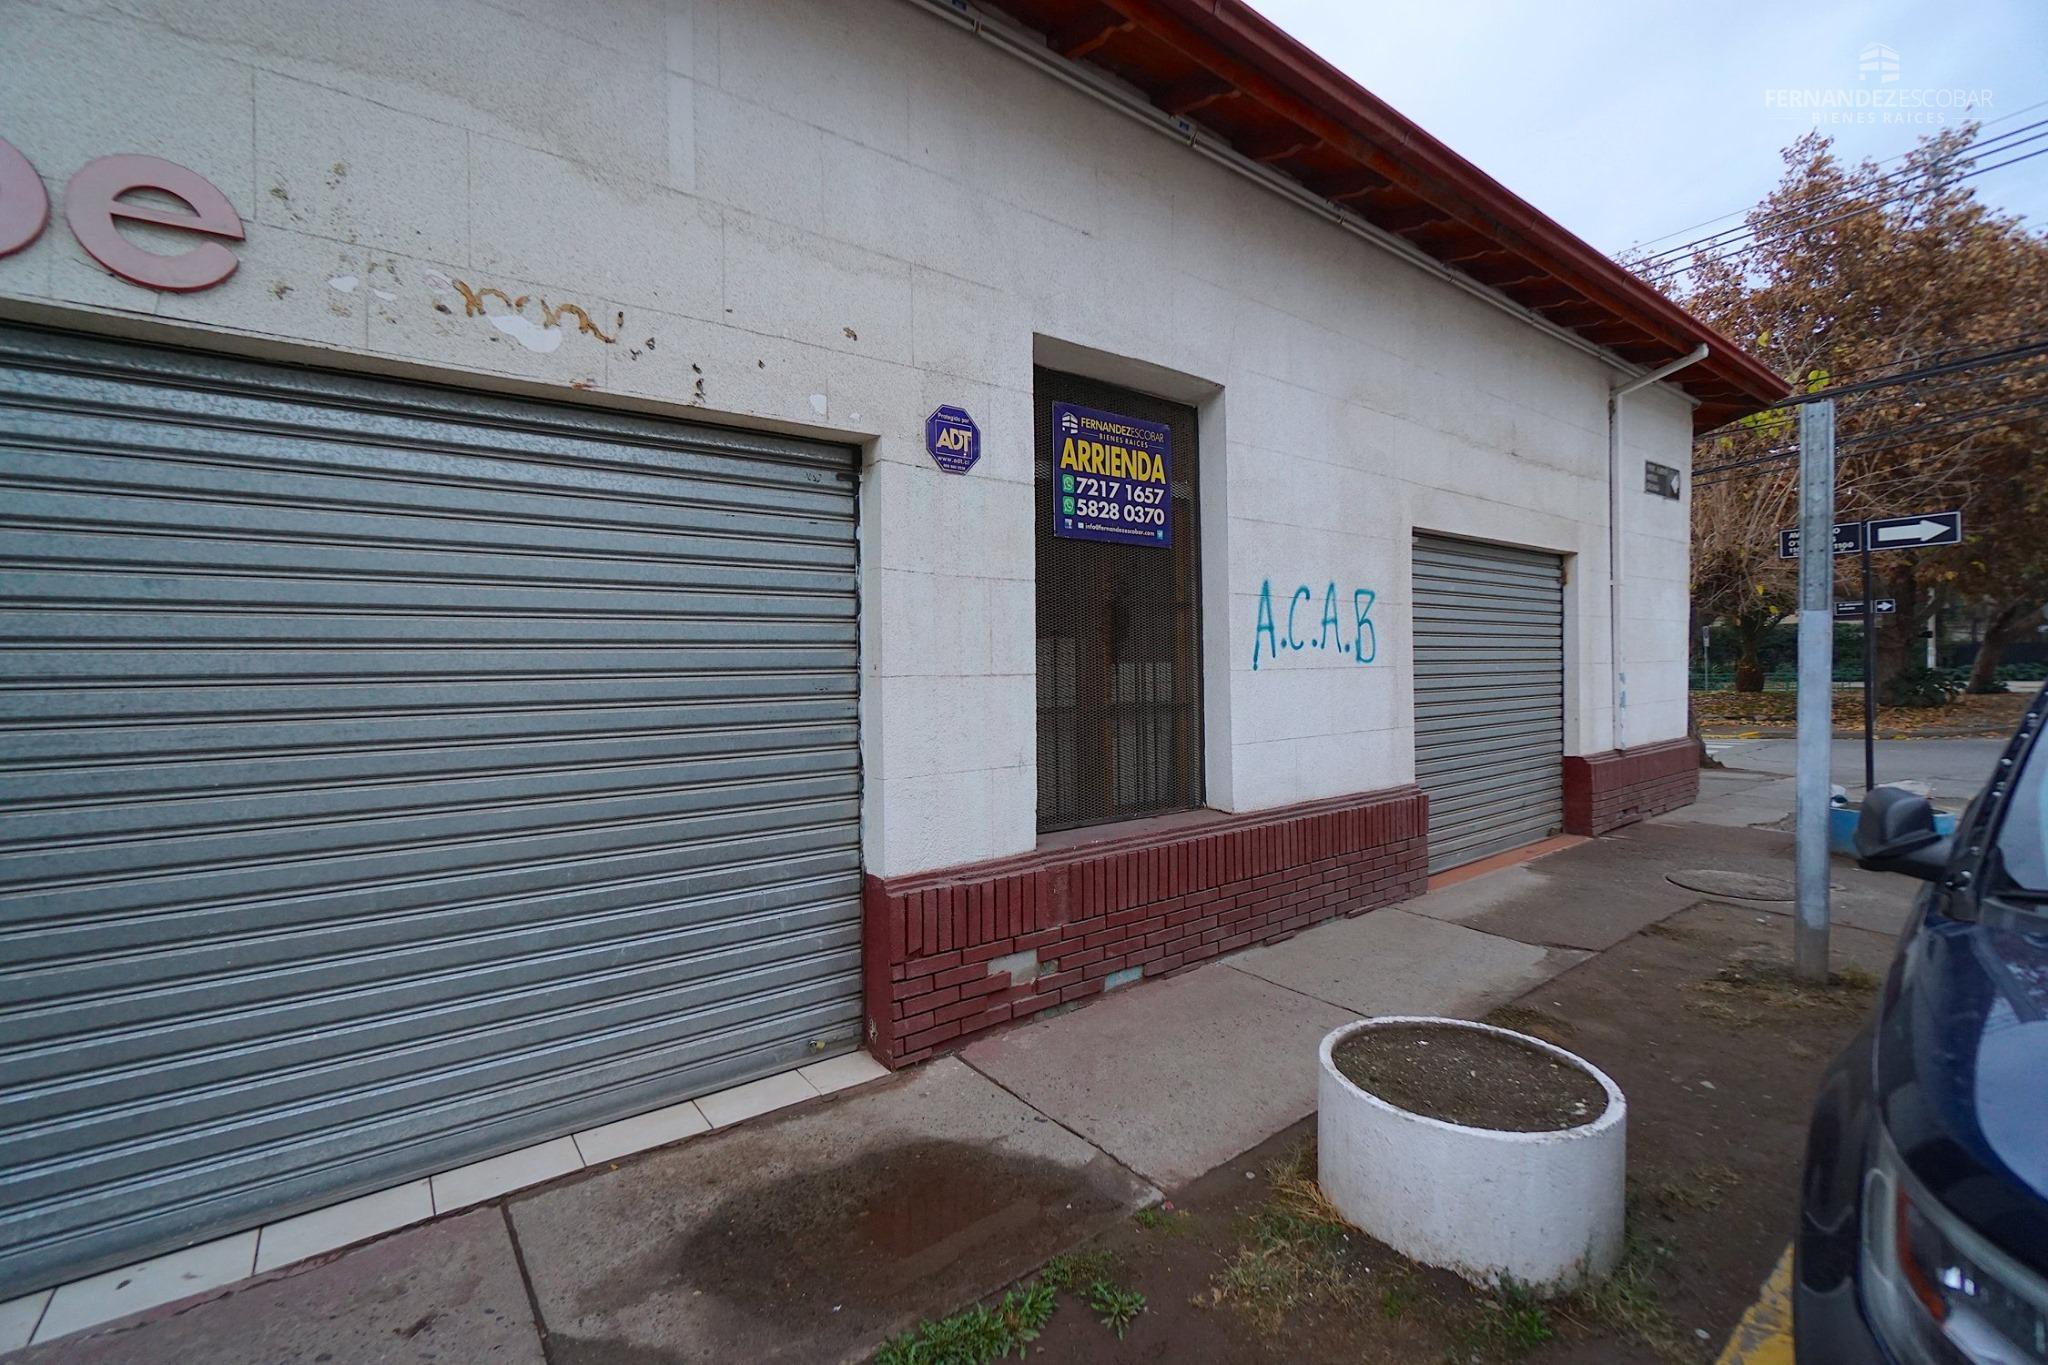 SAN FELIPE - ARRIENDO LOCAL COMERCIAL